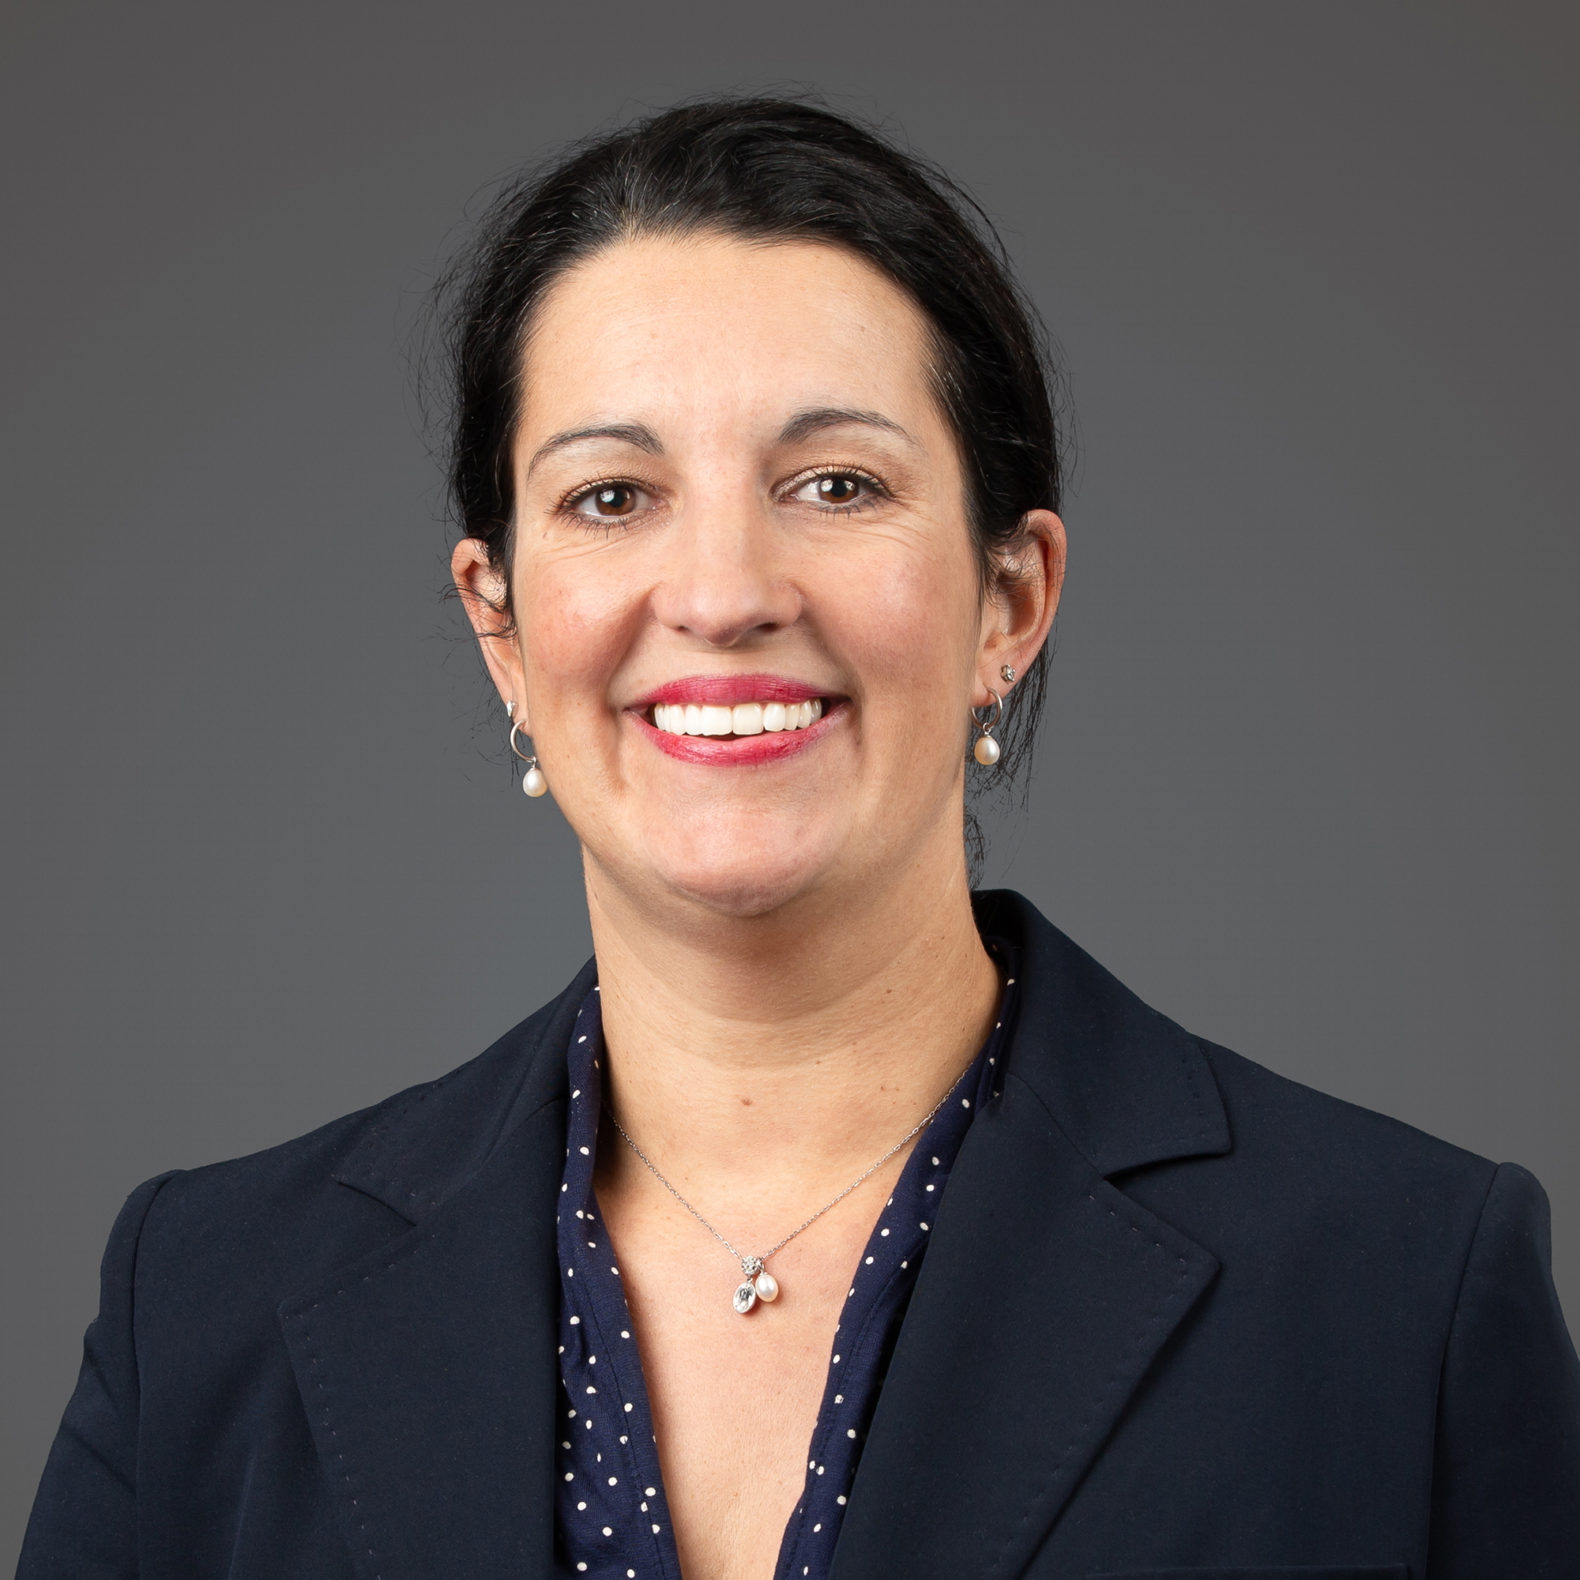 Delphine Klopfenstein Broggini